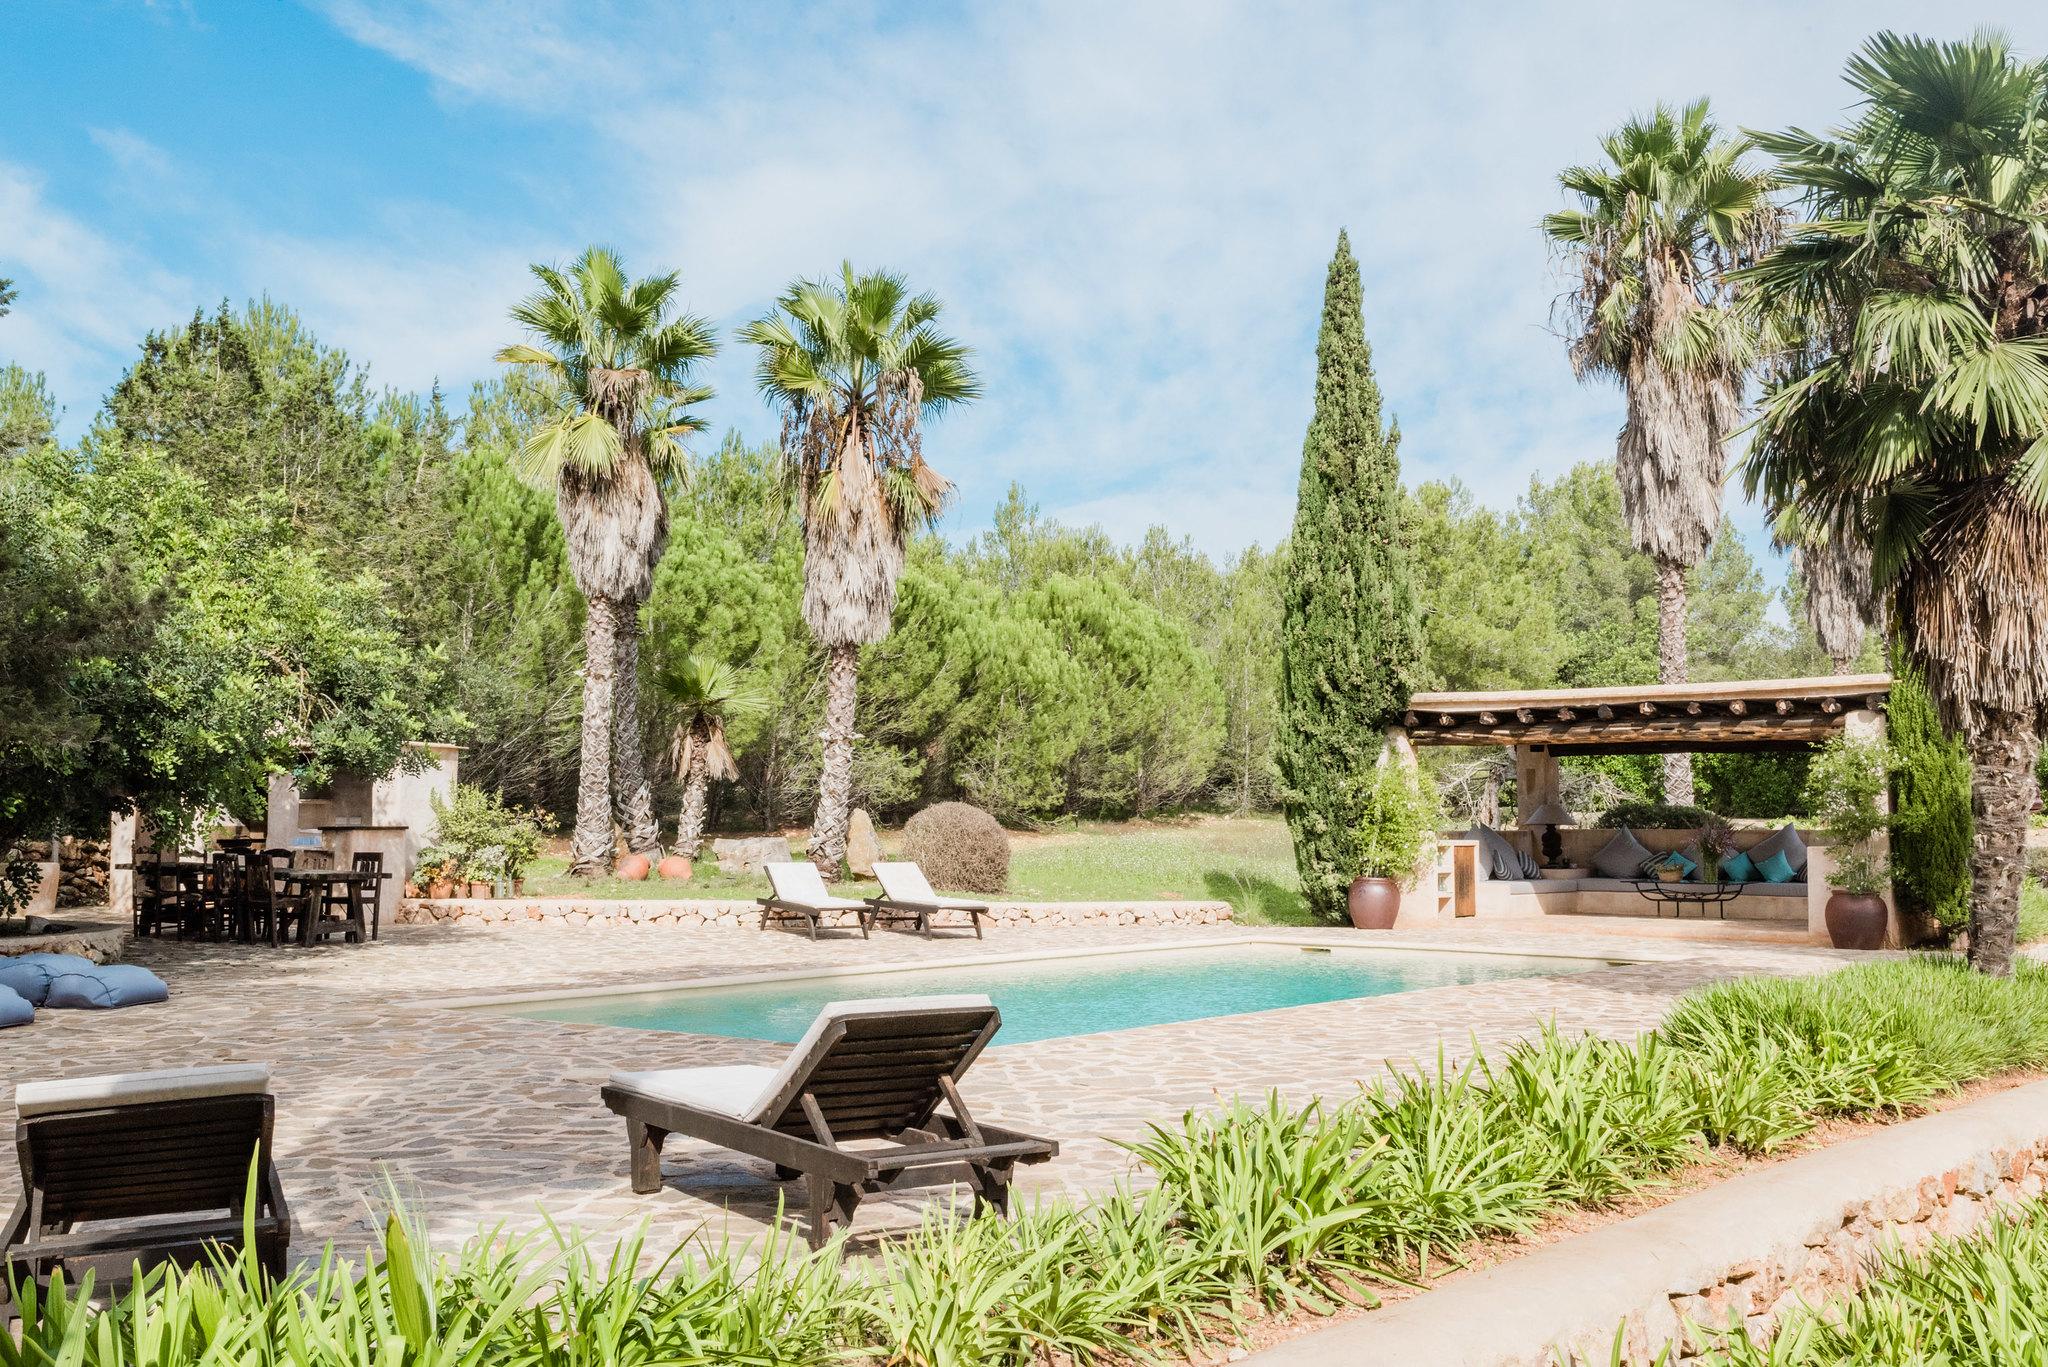 https://www.white-ibiza.com/wp-content/uploads/2020/05/white-ibiza-villas-can-sabina-exterior-sunloungers.jpg